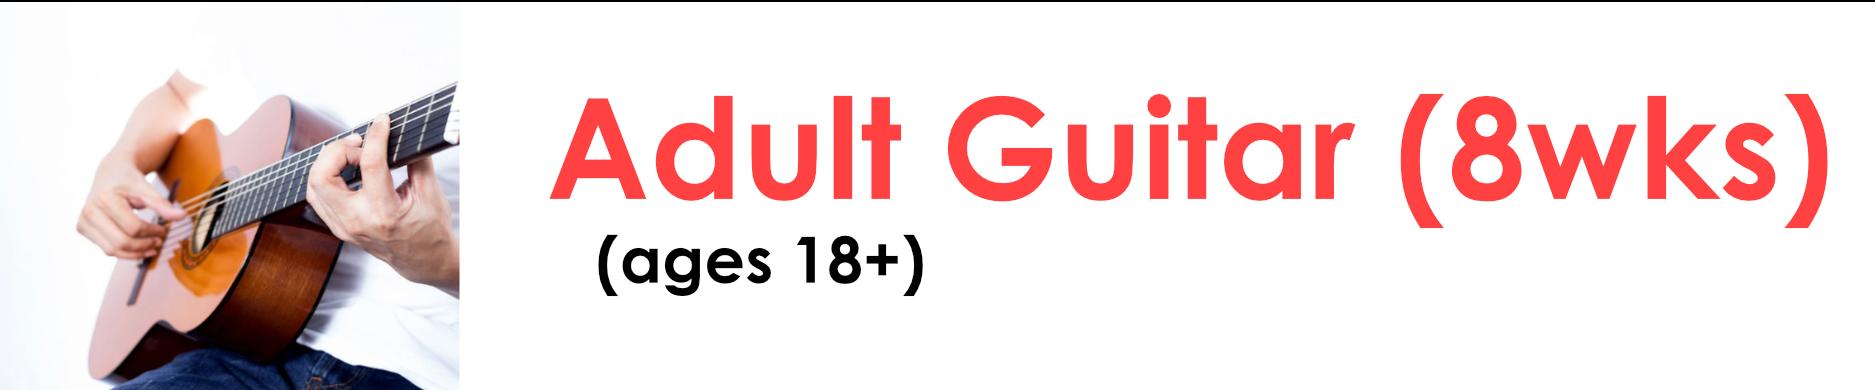 Adult Guitar Summer - 8 Weeks.png